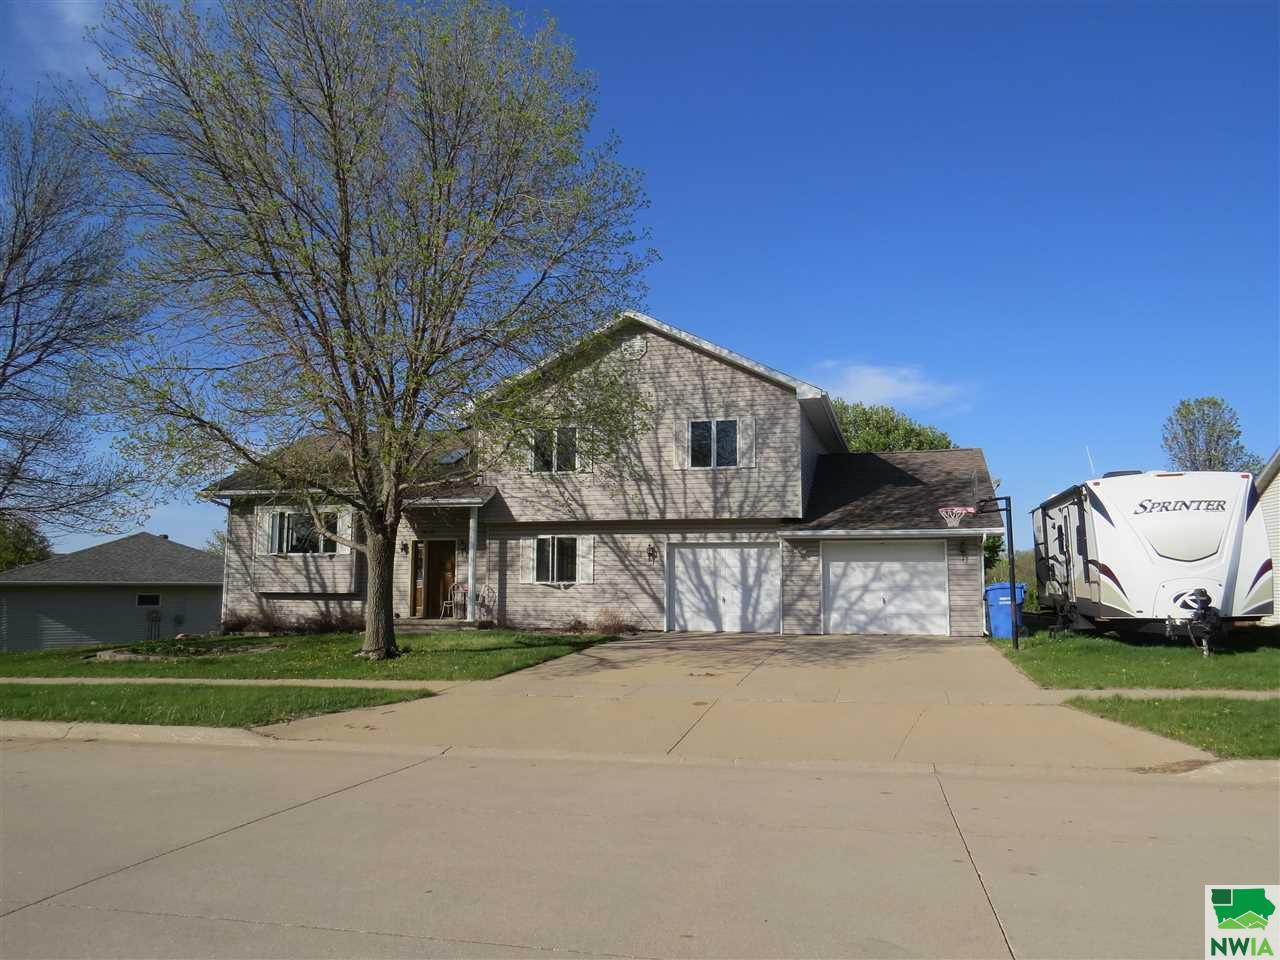 1650 4th Ave. SW, LeMars, Iowa 51031